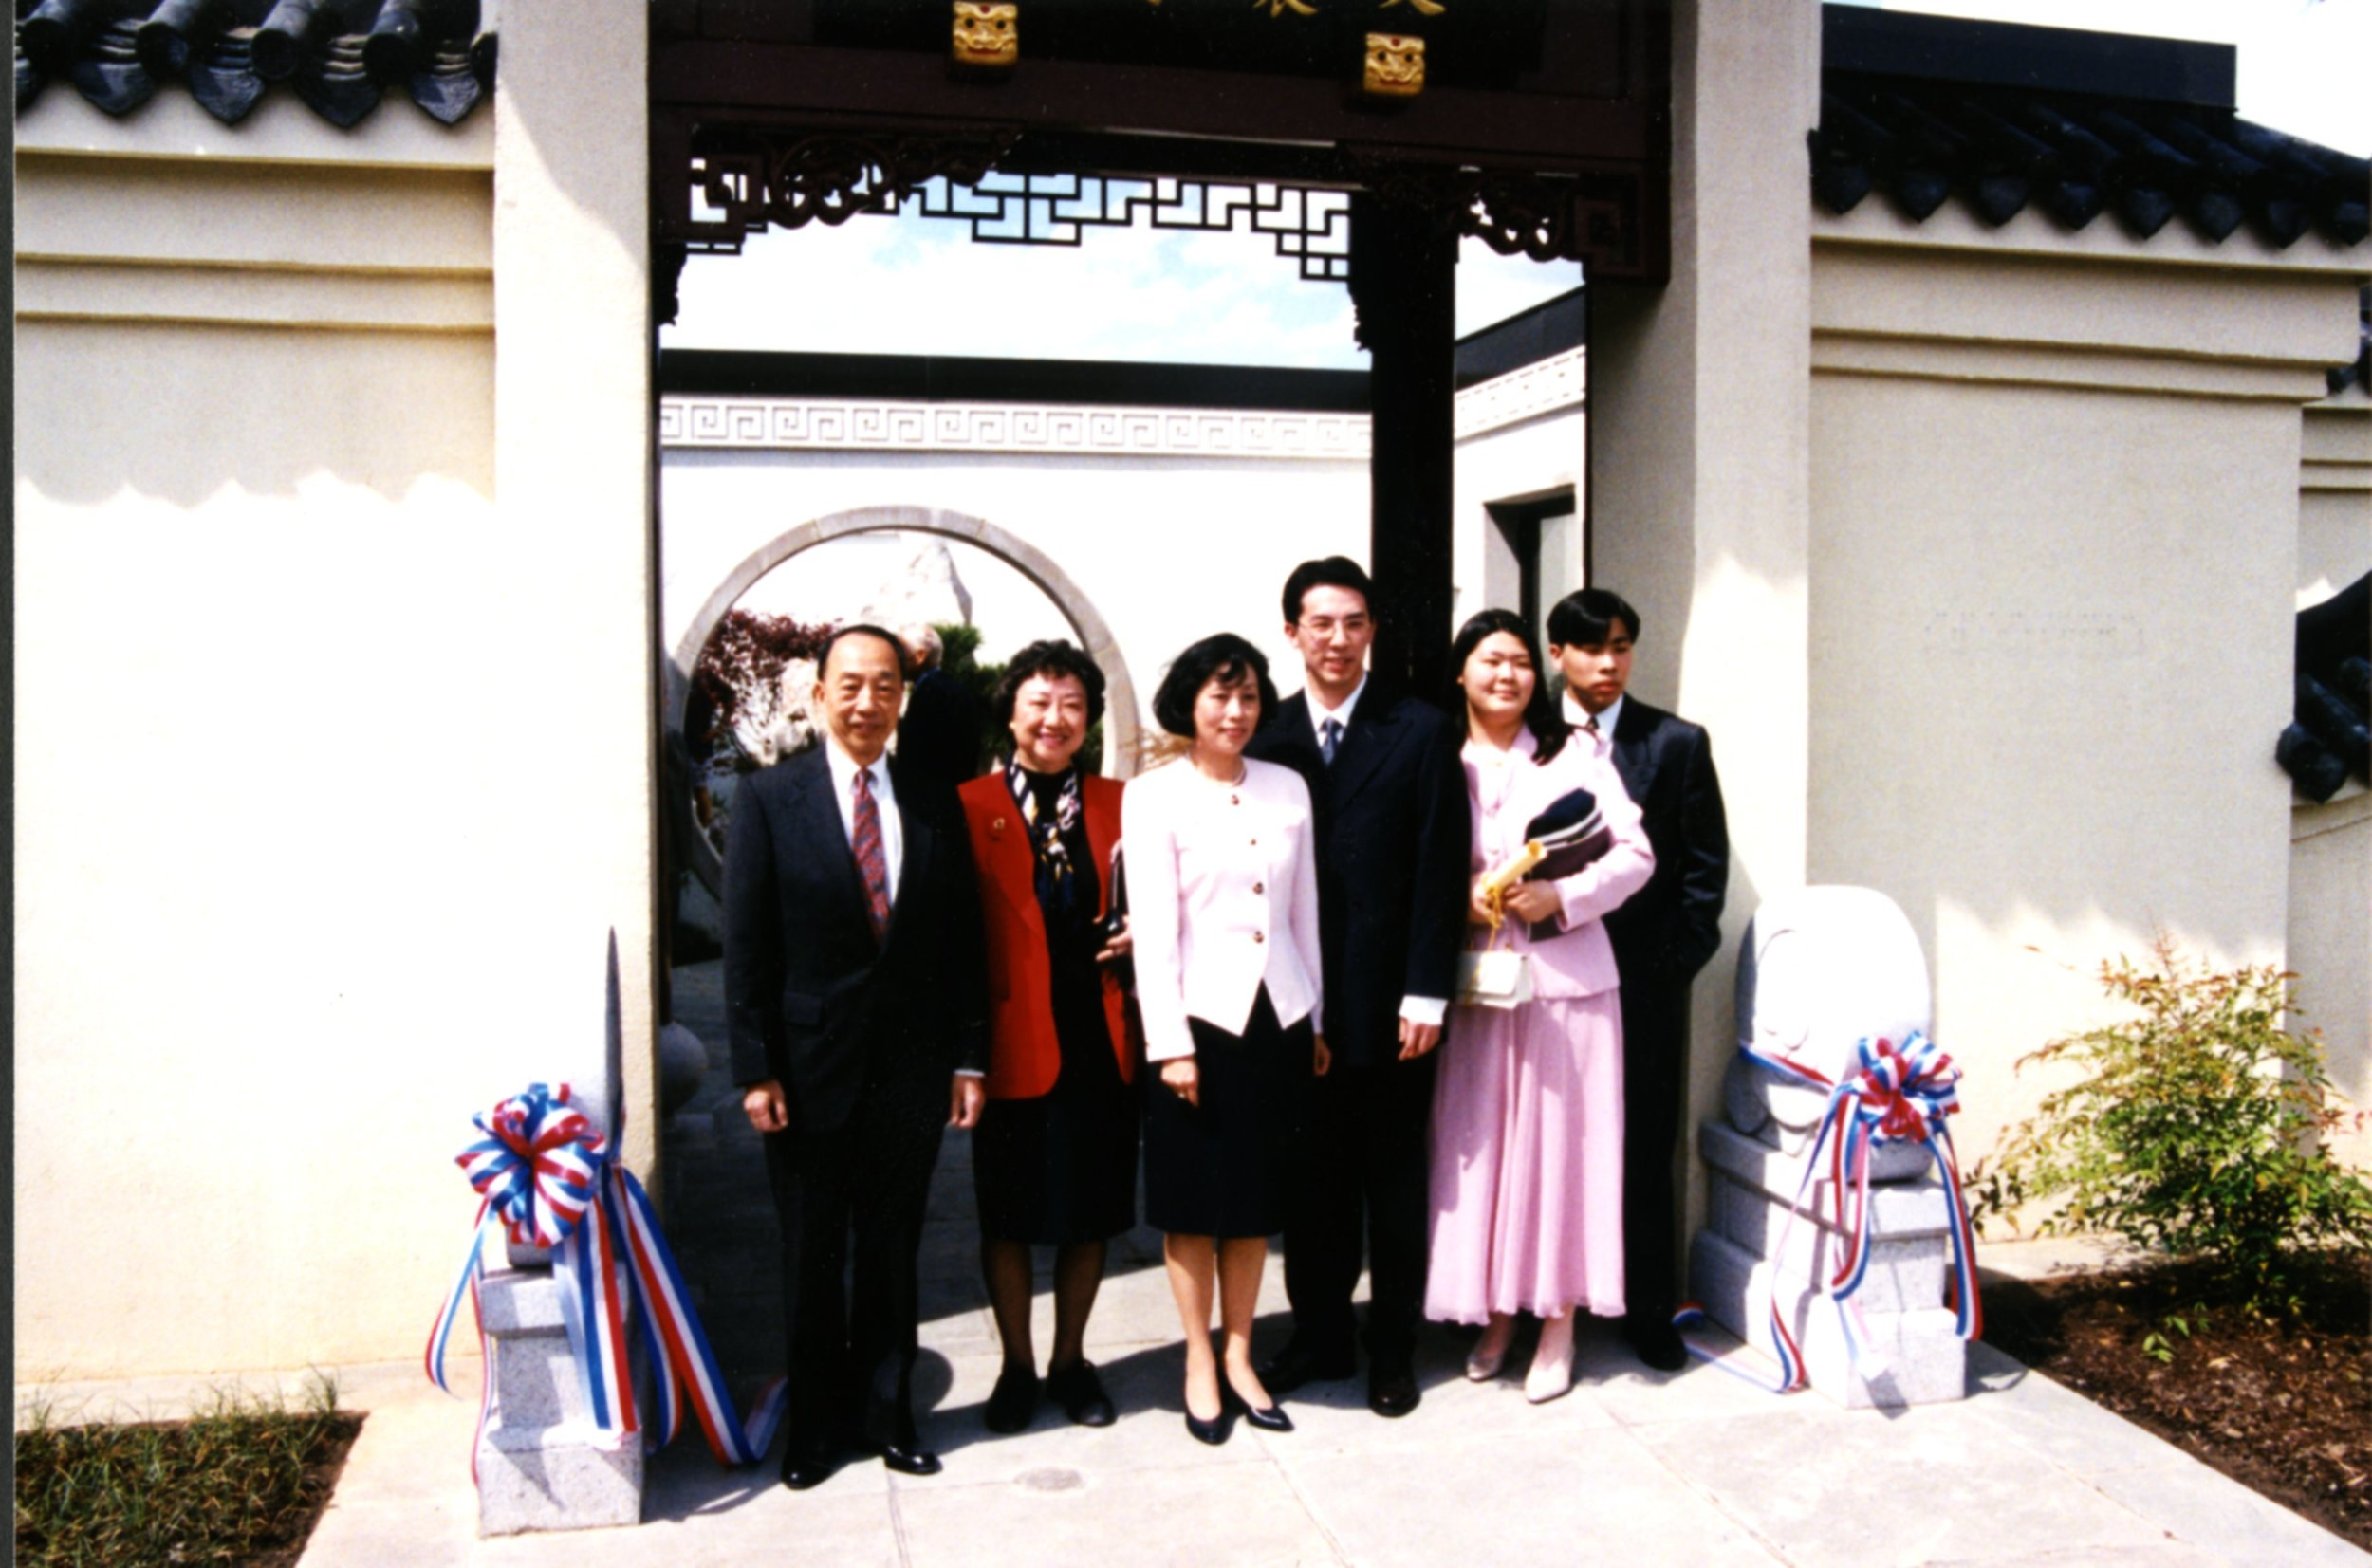 Opening Day - Chinese Pavilion - International Pavilion_014.jpg